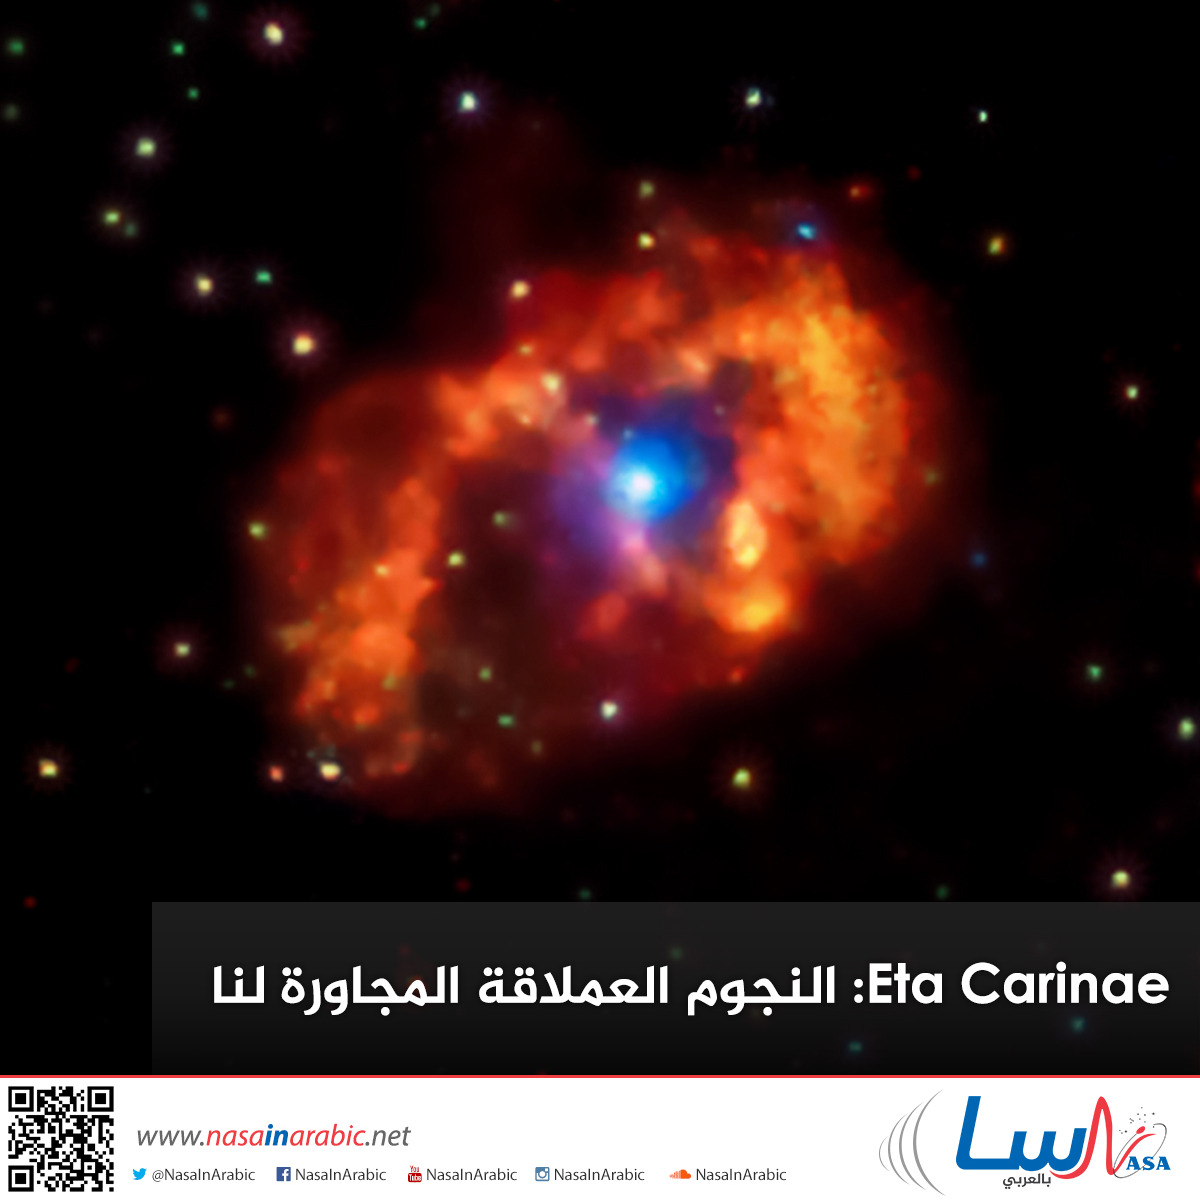 Eta Carinae: النجوم العملاقة المجاورة لنا